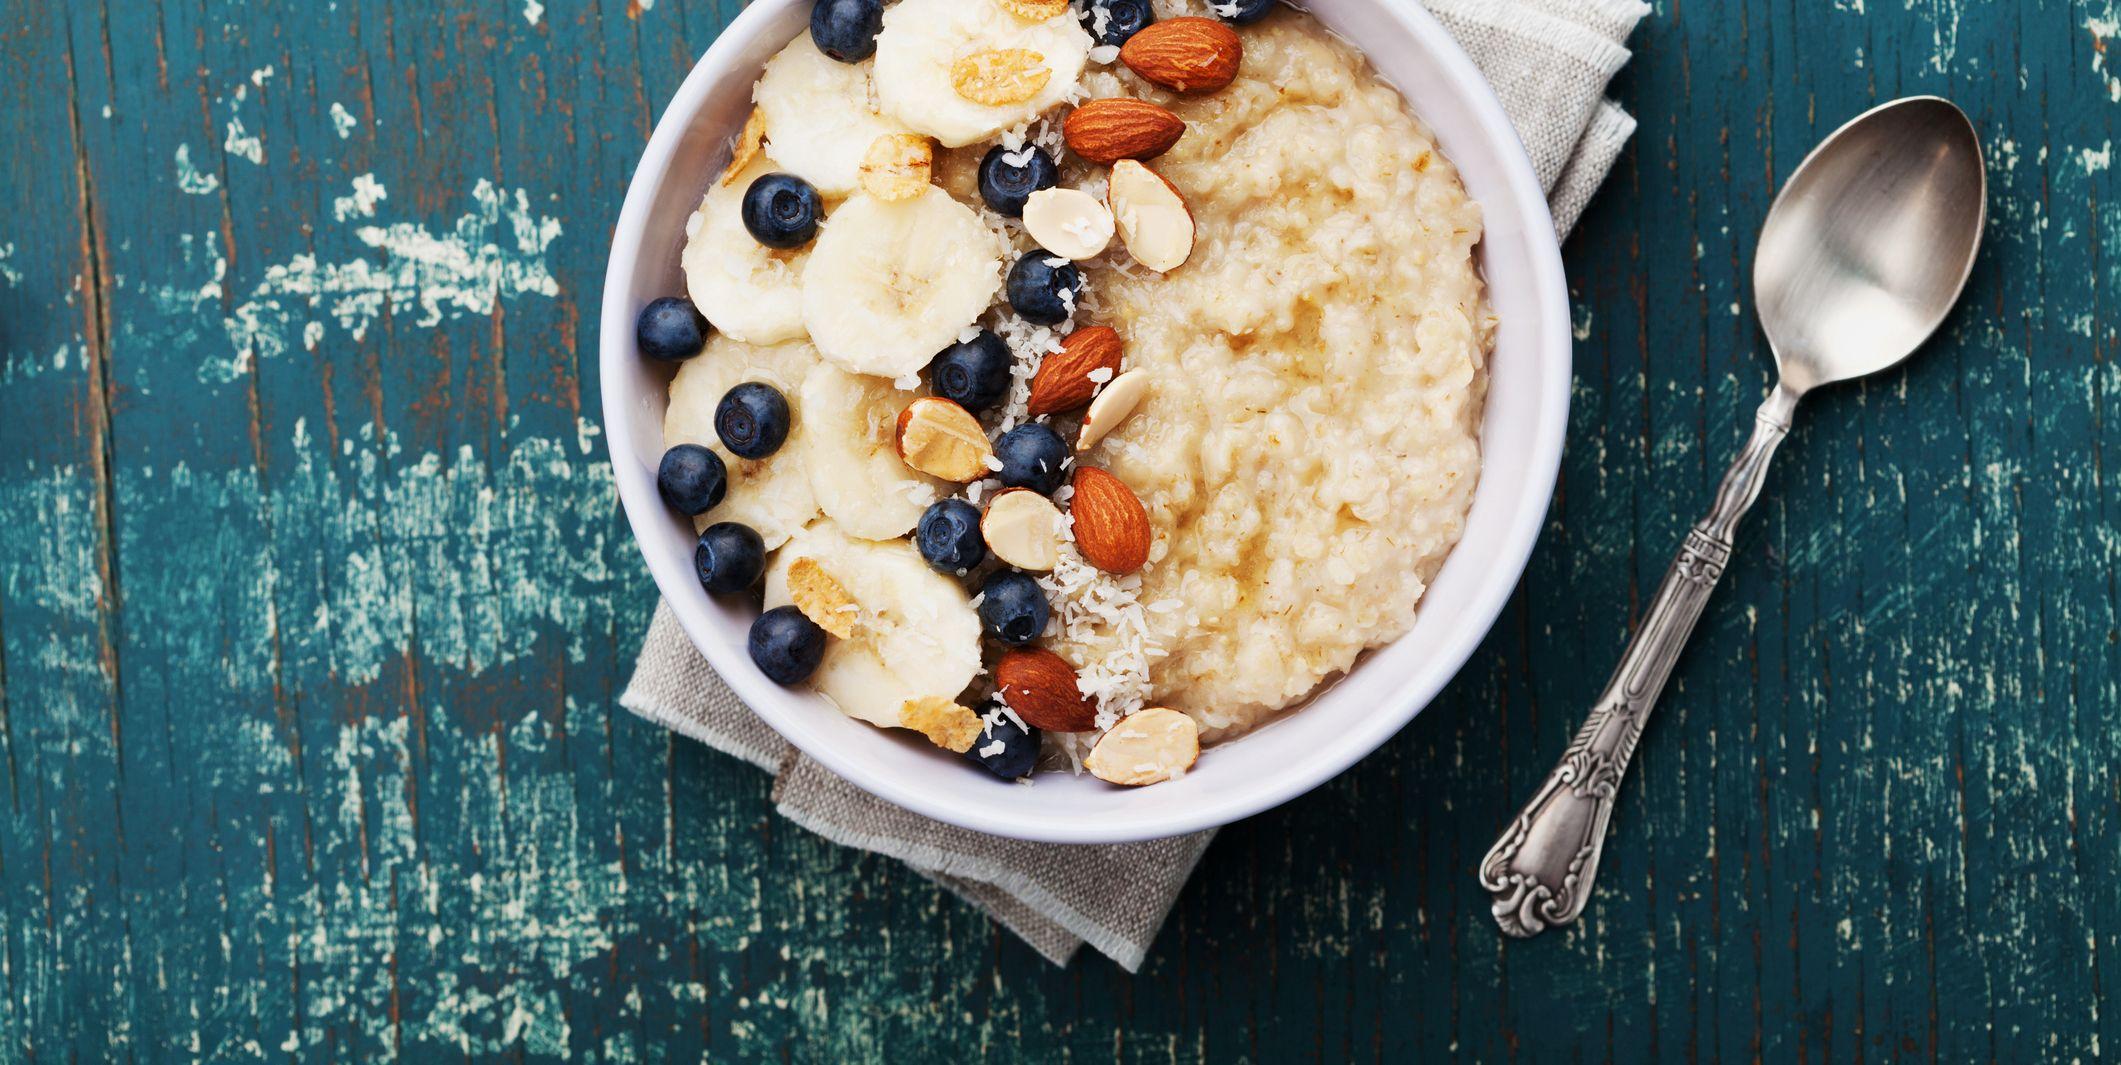 Oatmeal porridge, healthy food for breakfast, top view, flat lay